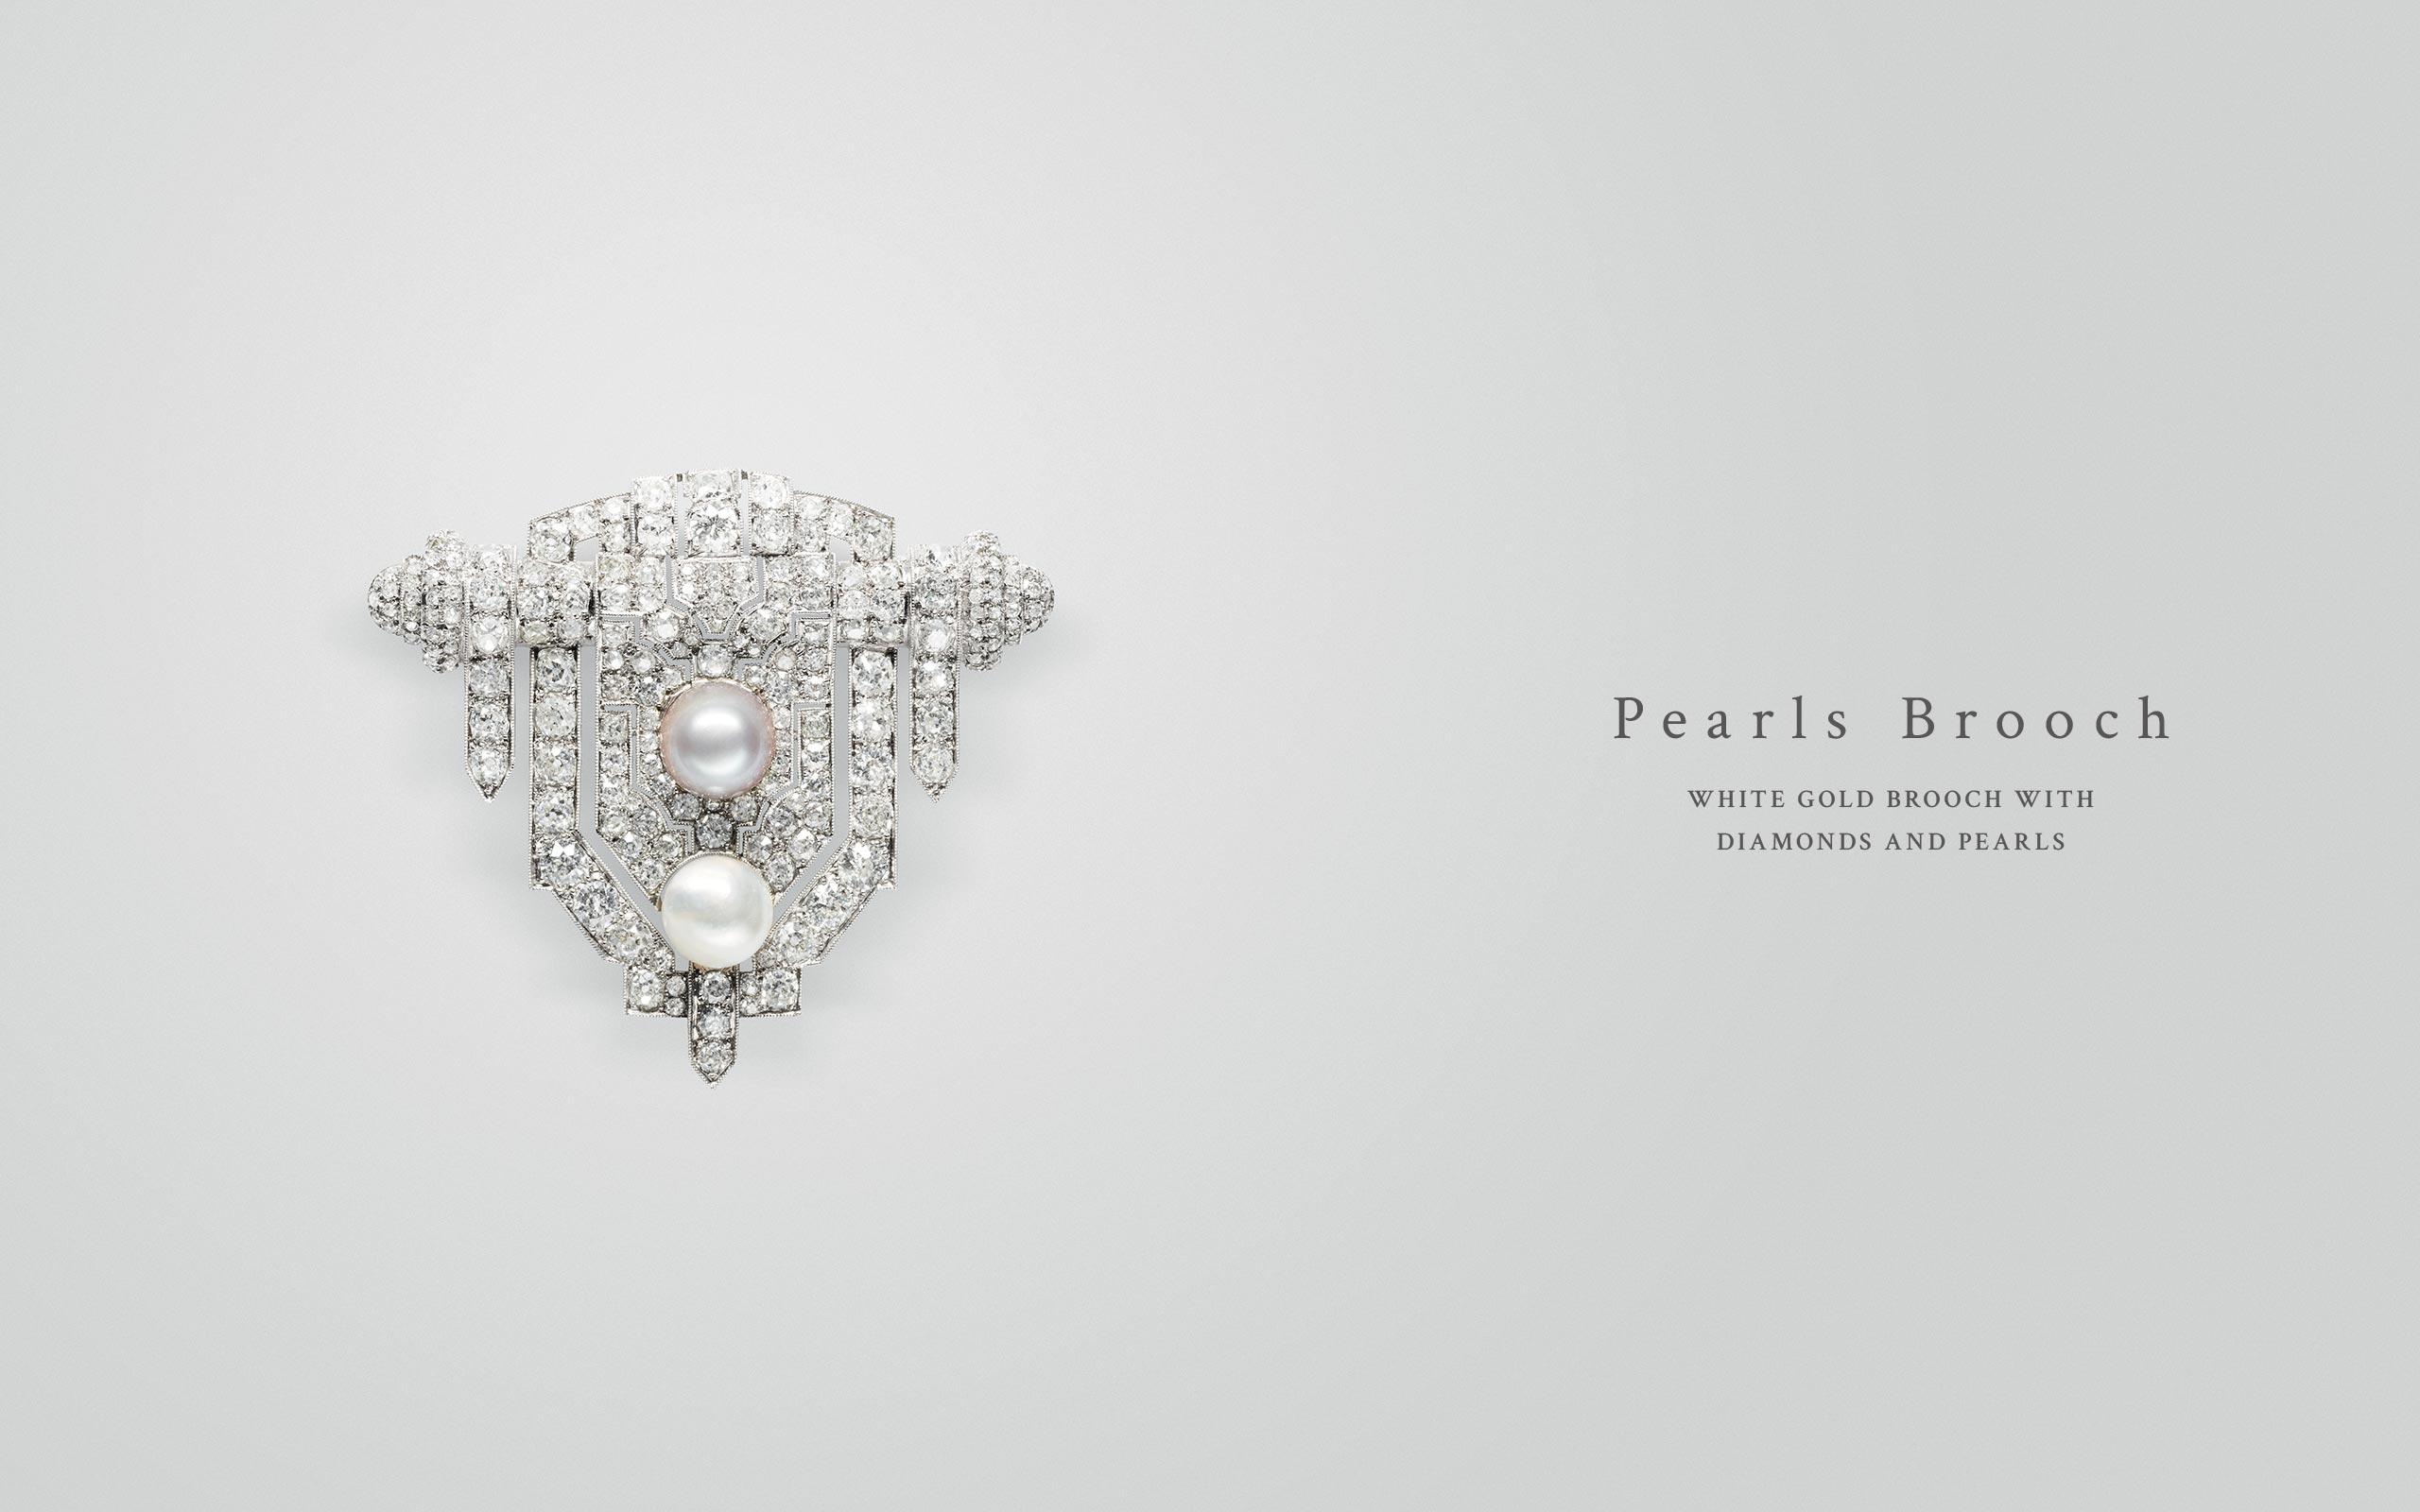 Pearls Brooch 07 | Maria Gaspari